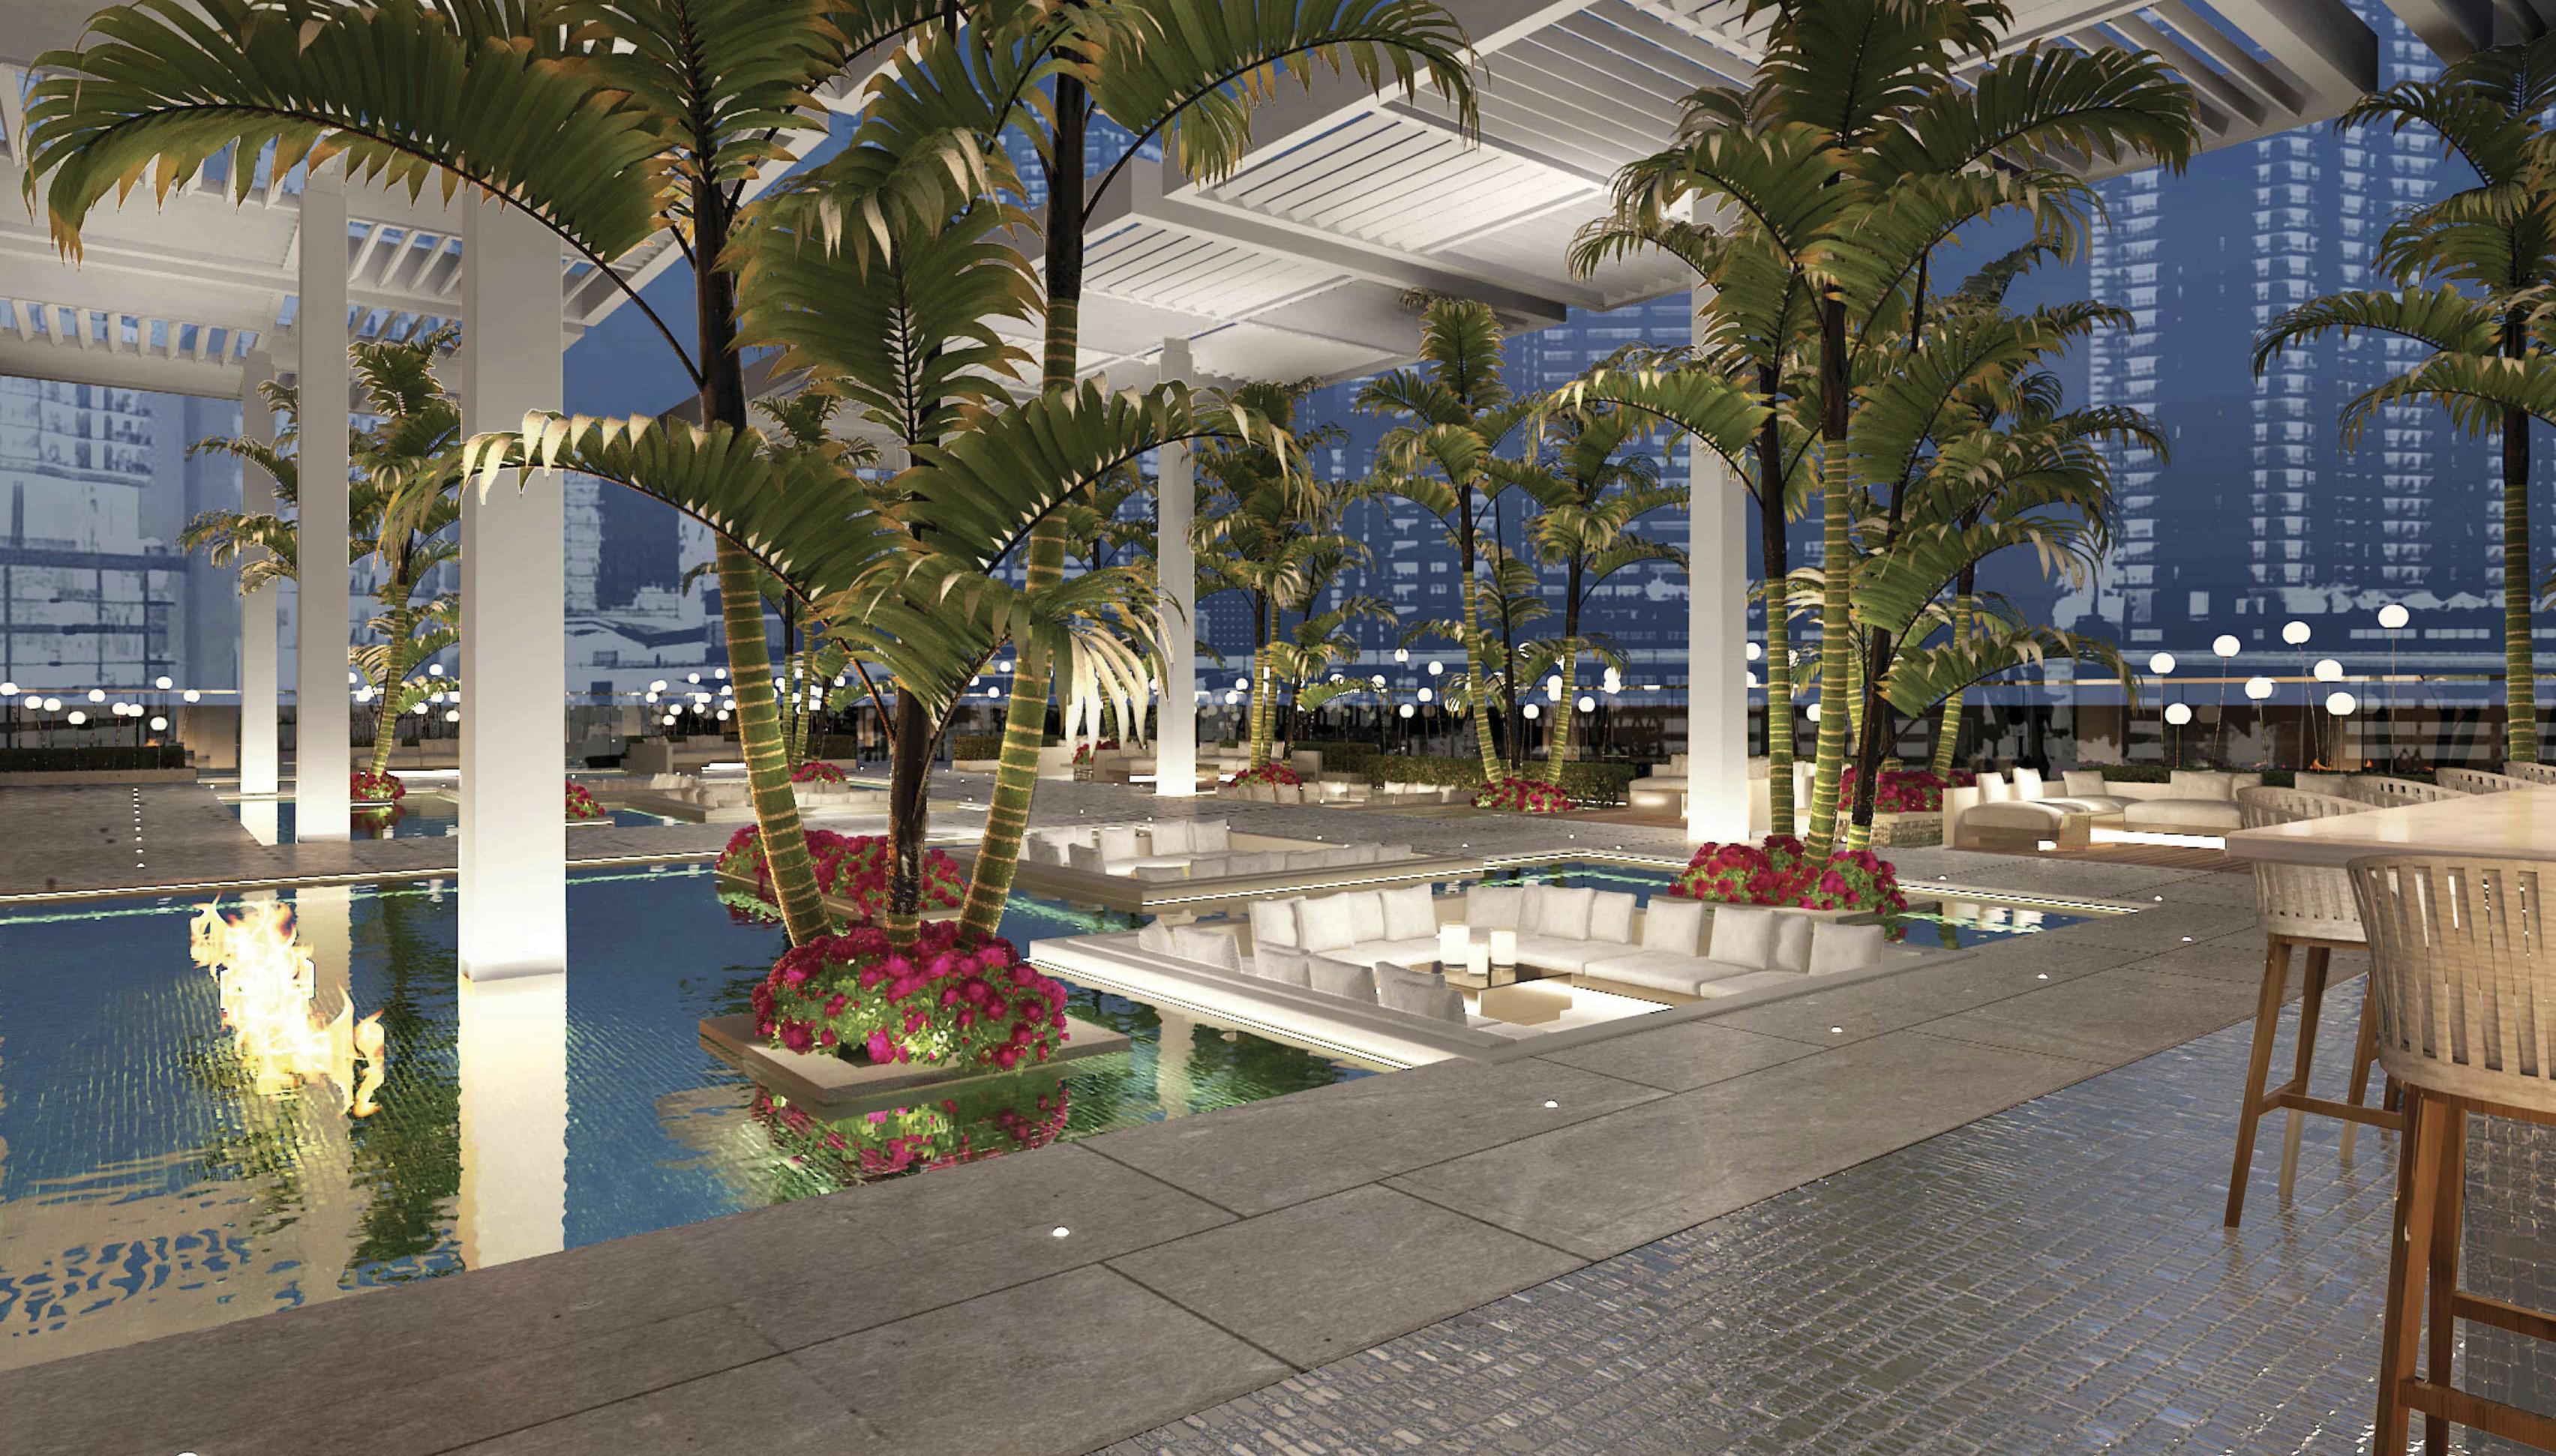 Legacy Hotel & Residences. Designed by Kobi Karp.